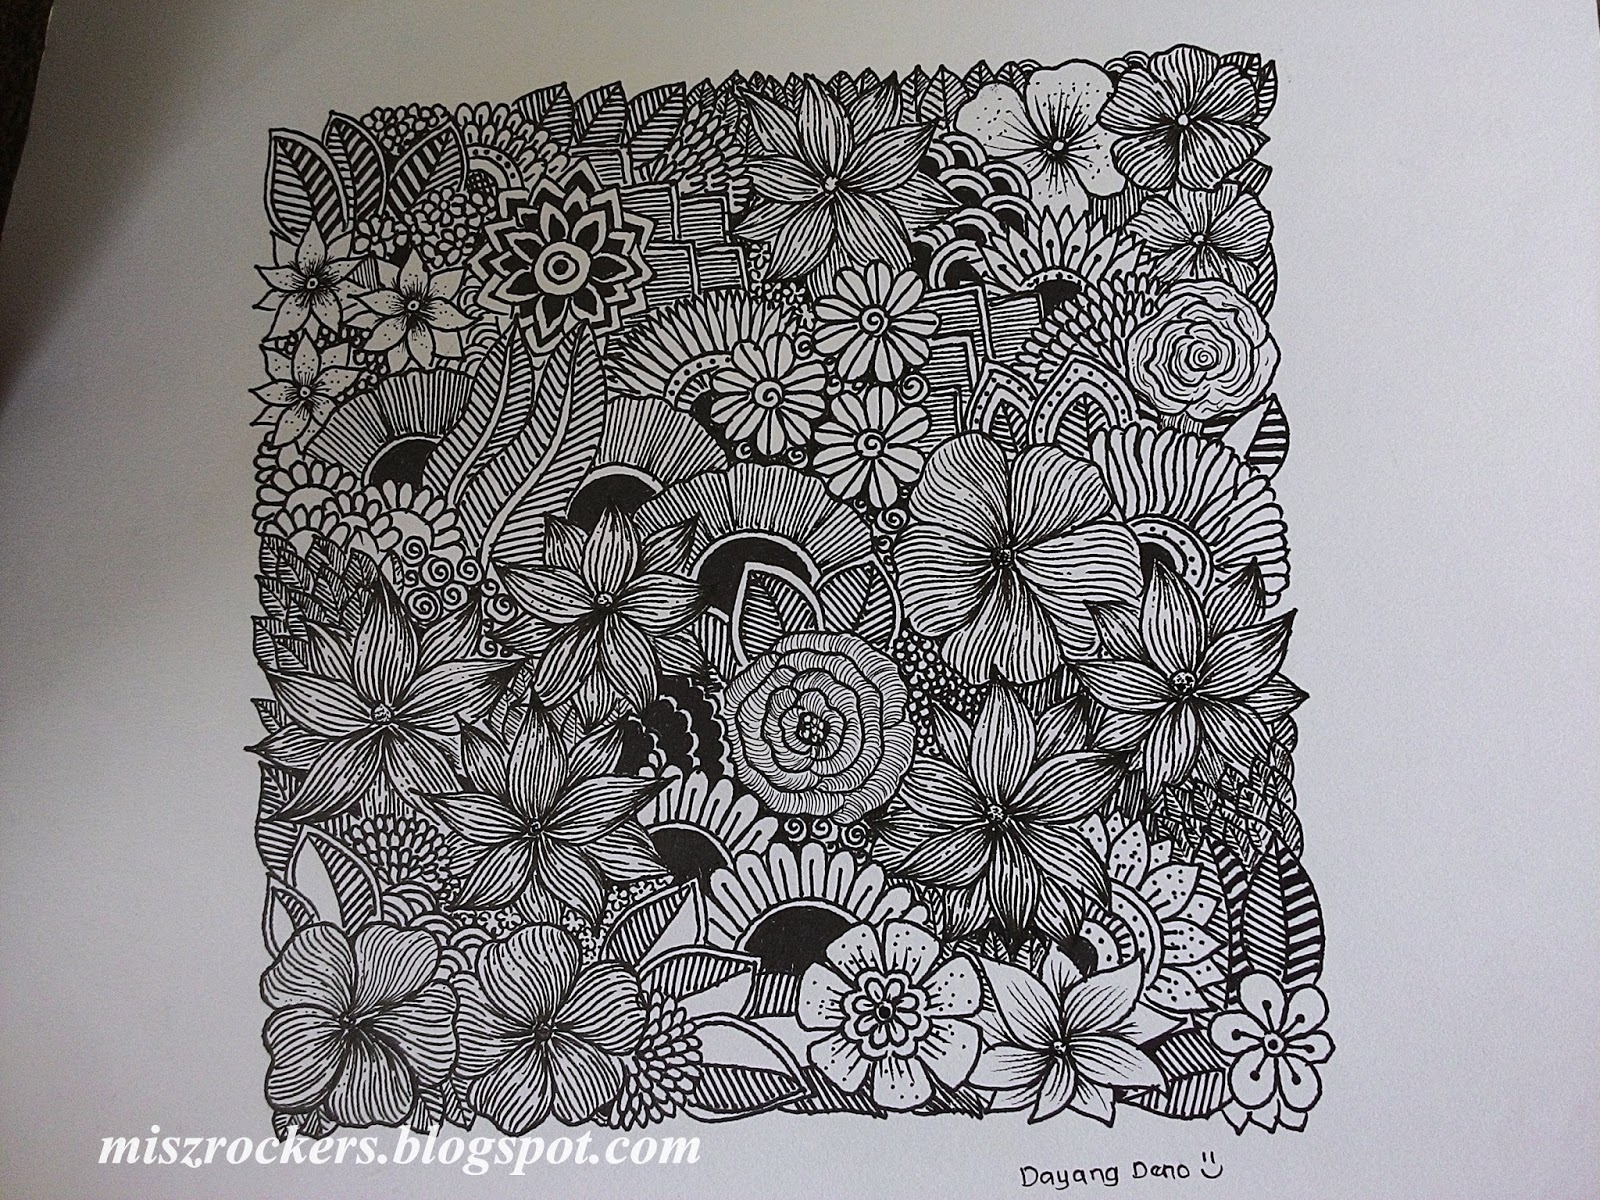 Lukisan Doodle Bunga